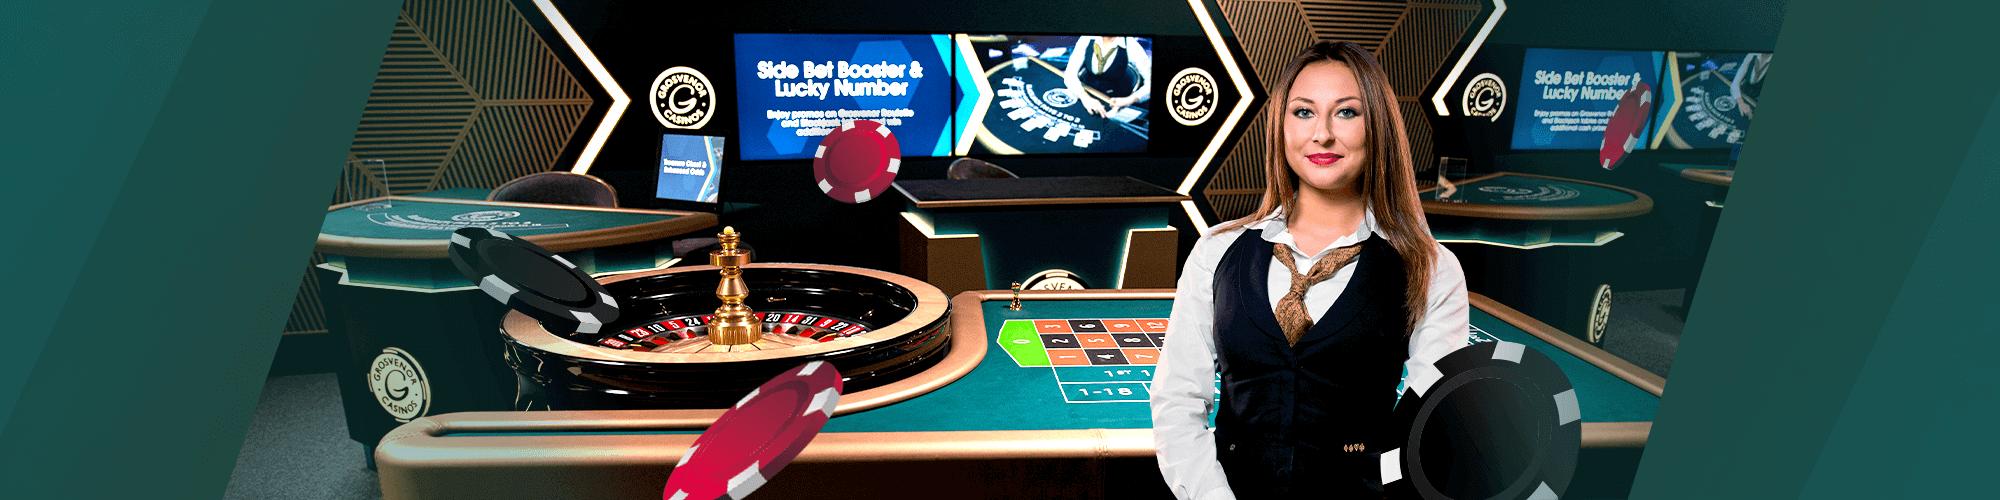 Mobile Casino Apps Android Ios Grosvenor Casinos